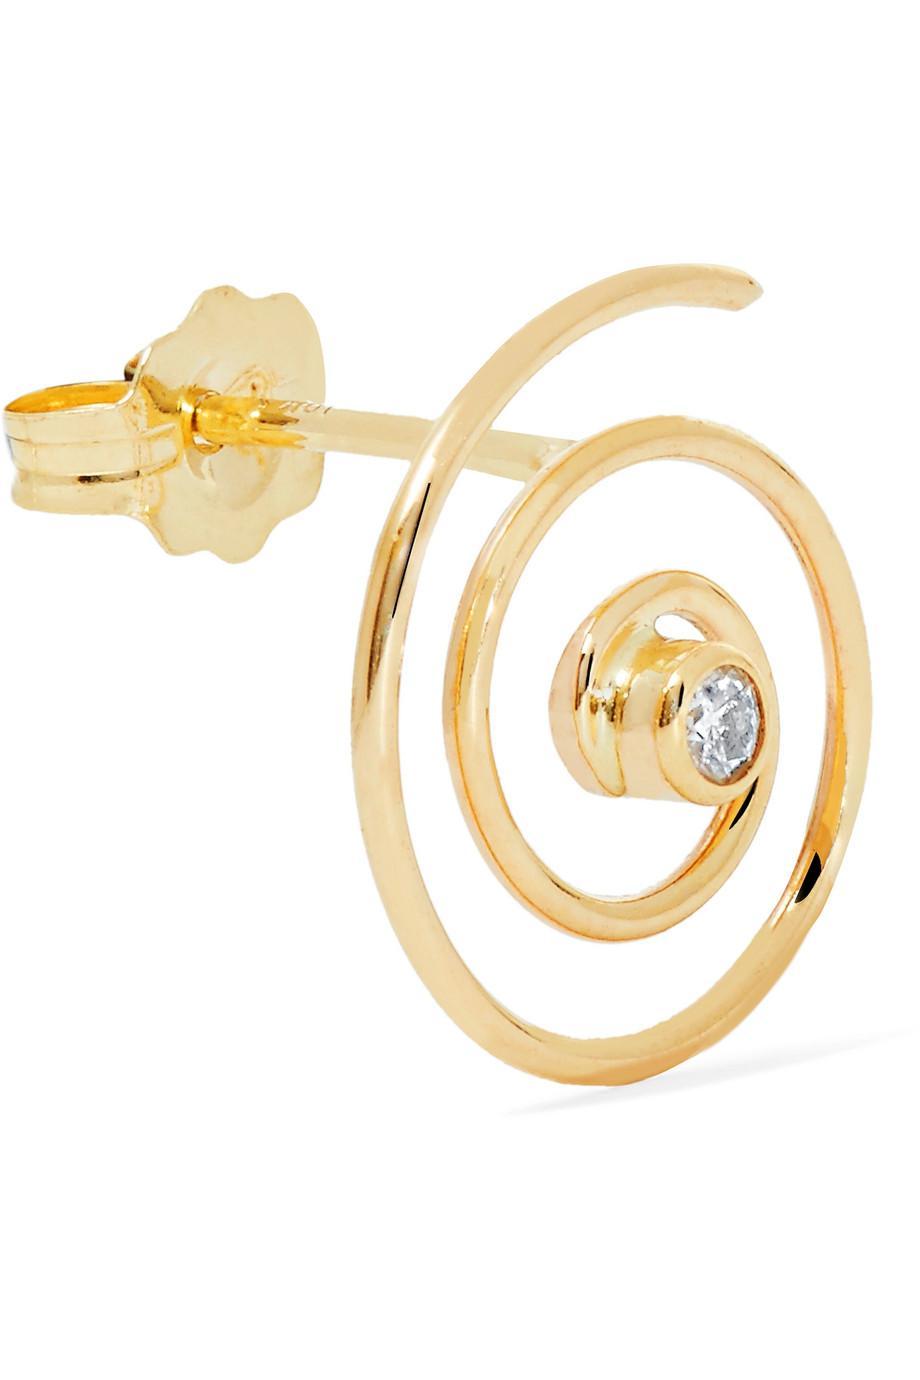 Beaufille Spiral 10-karat Gold Diamond Earring DcLAn4xf7